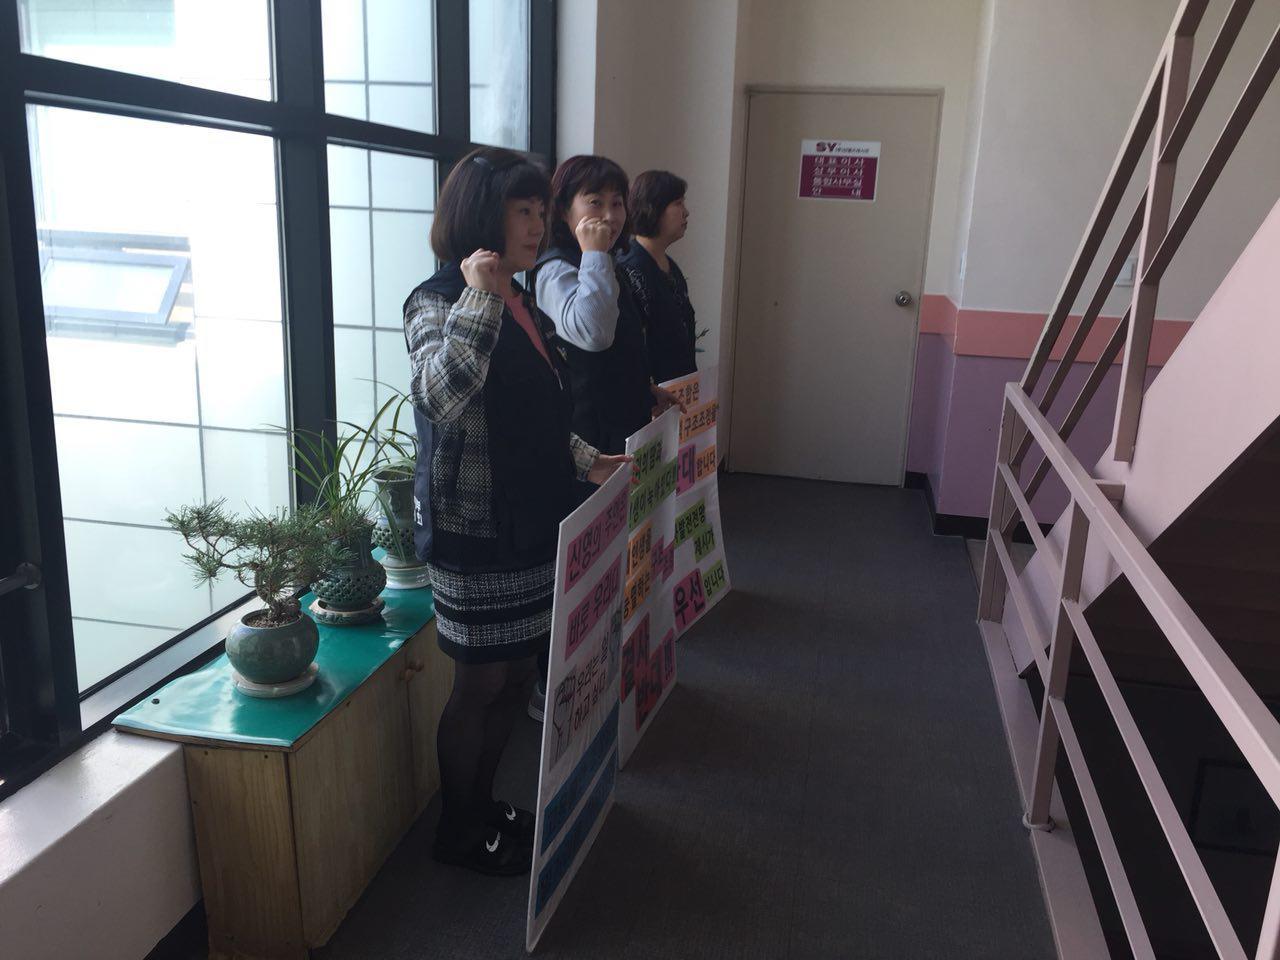 photo_2018-10-01_13-55-00.jpg